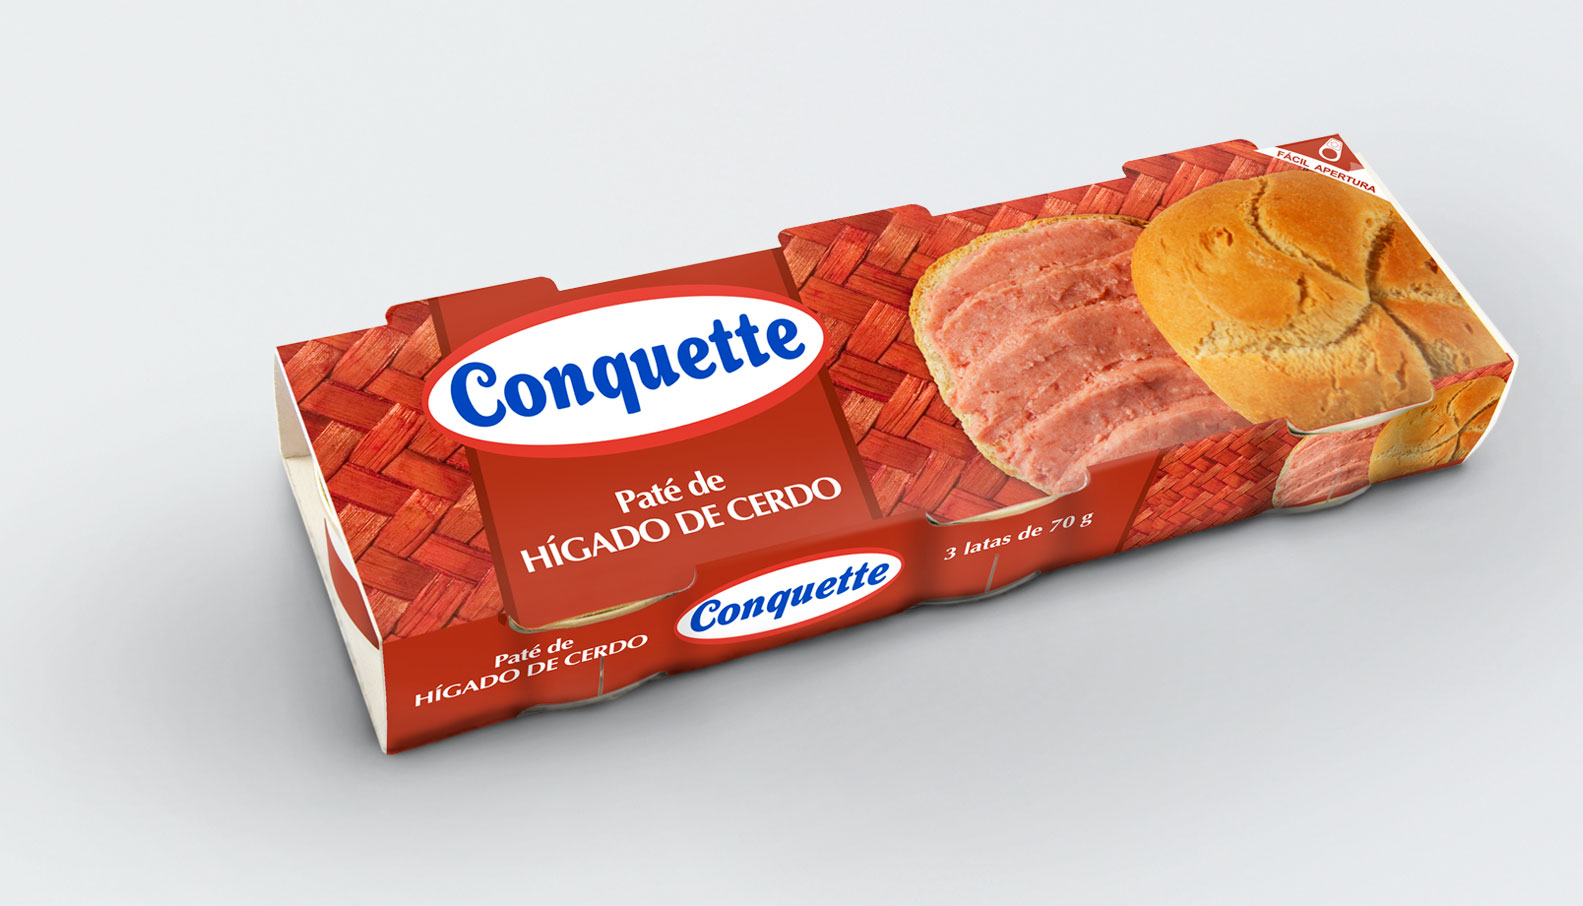 006_conquette_packaging-diseno-branding-marca-embalaje-envoltorio-caja-cartoncillo